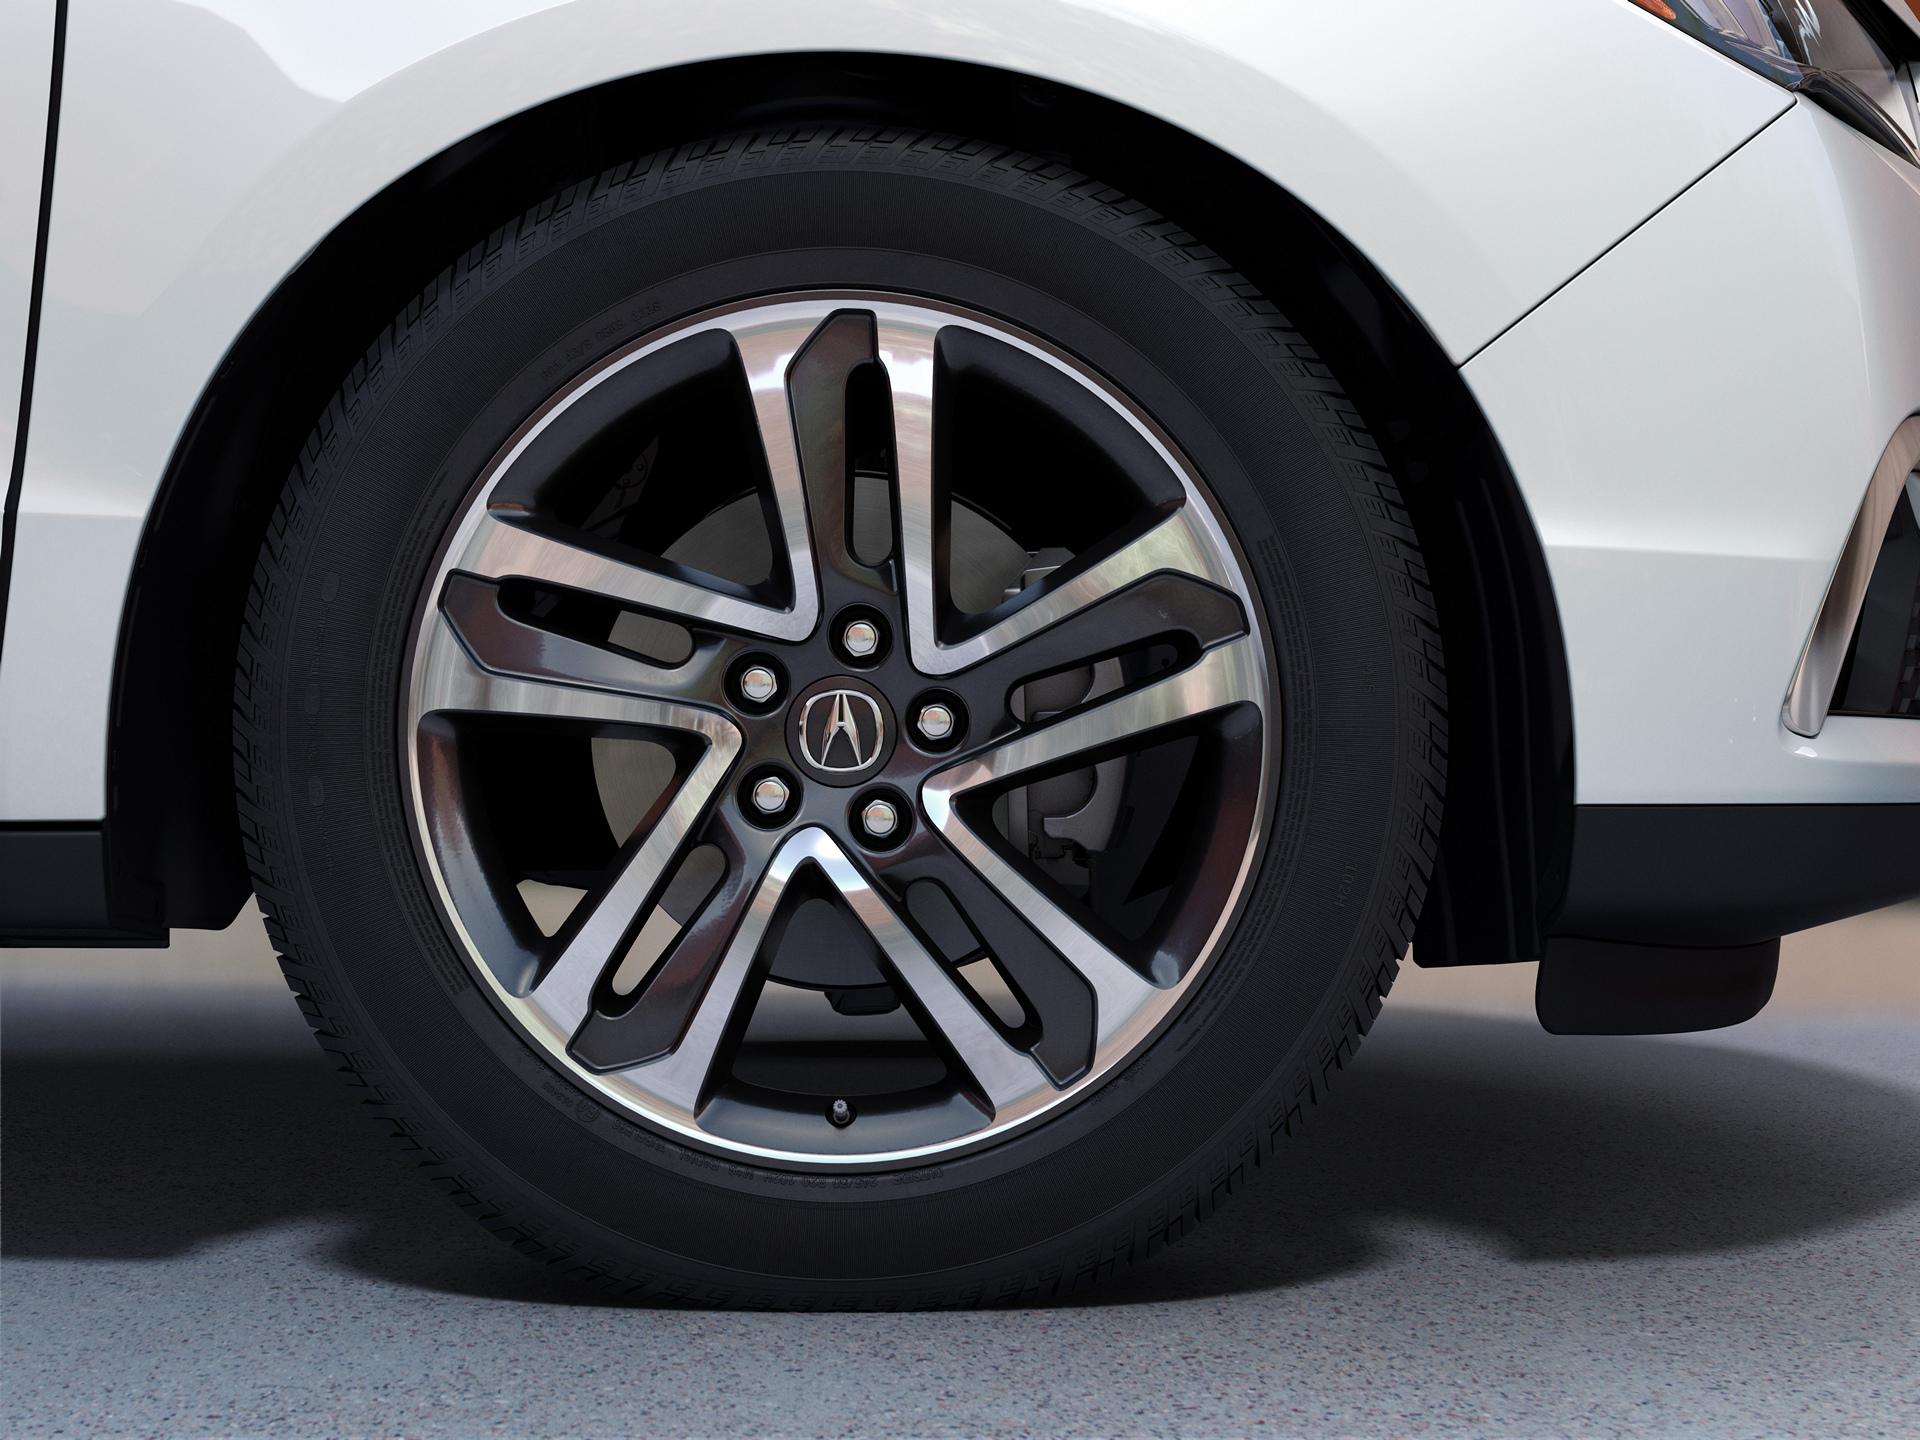 2017 Acura MDX © Honda Motor Co., Ltd.